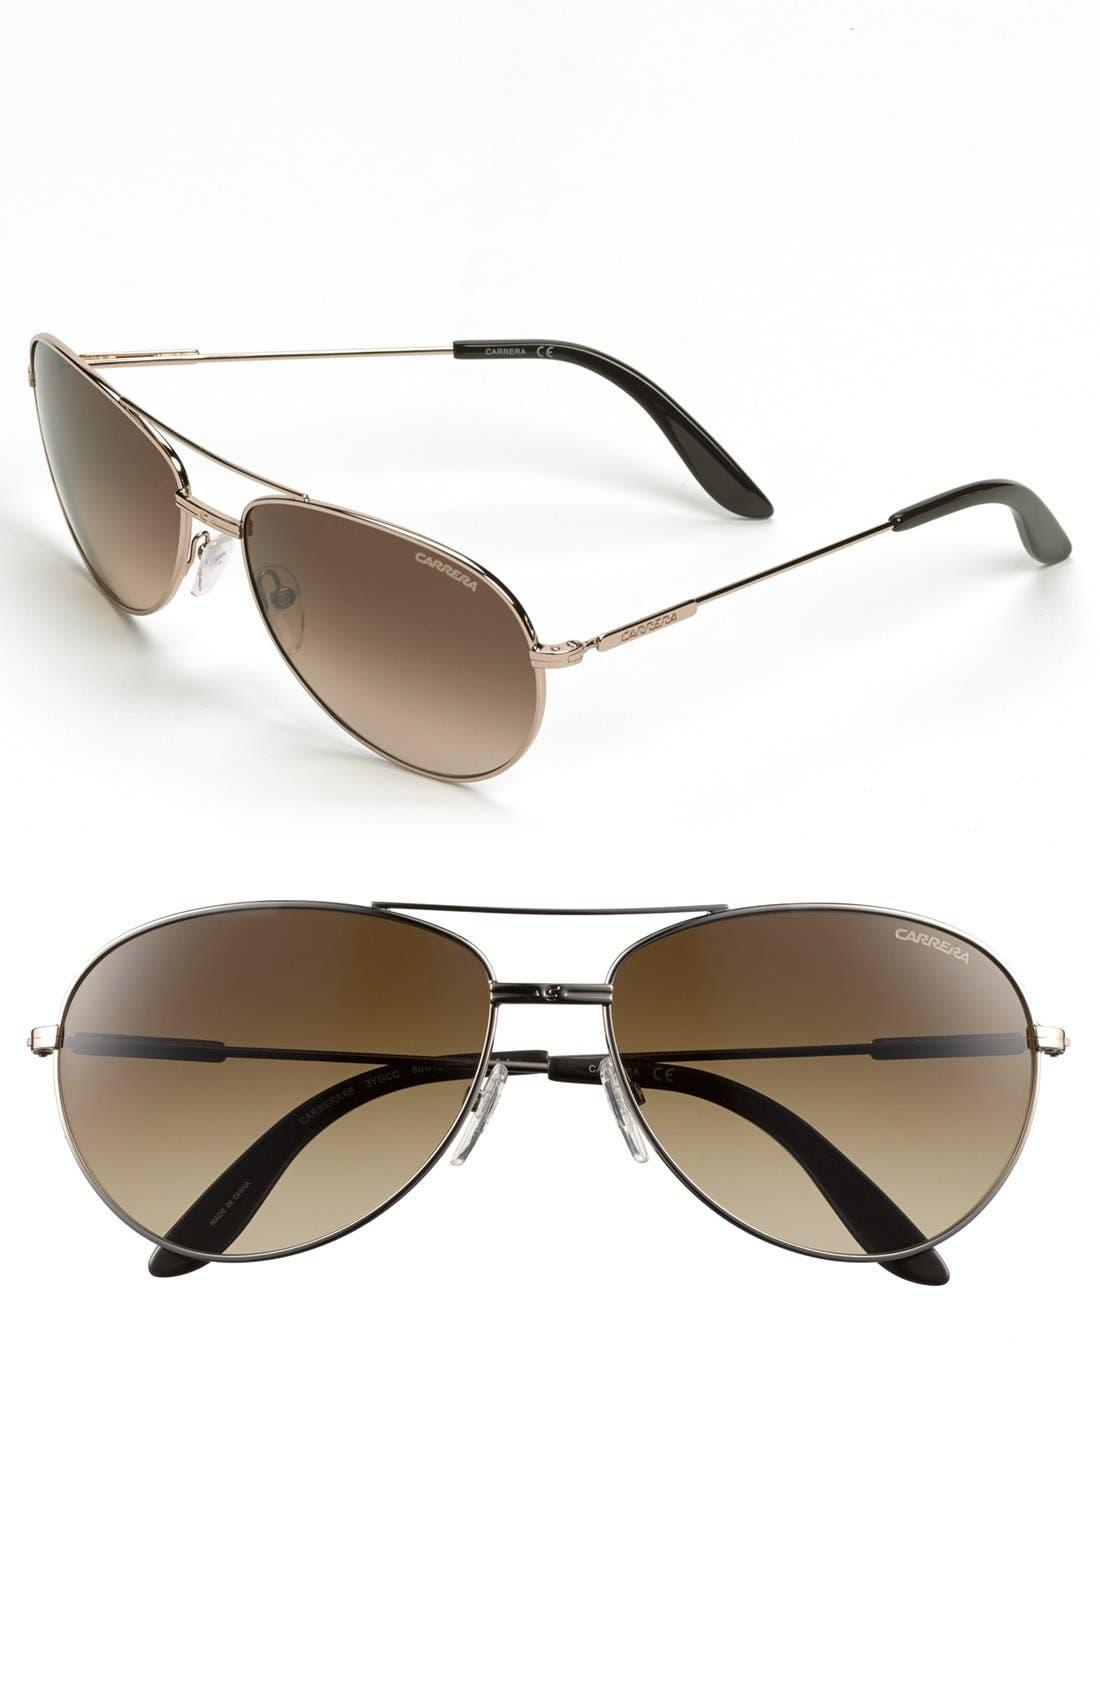 Main Image - Carrera Eyewear '69/S' 60mm Sunglasses